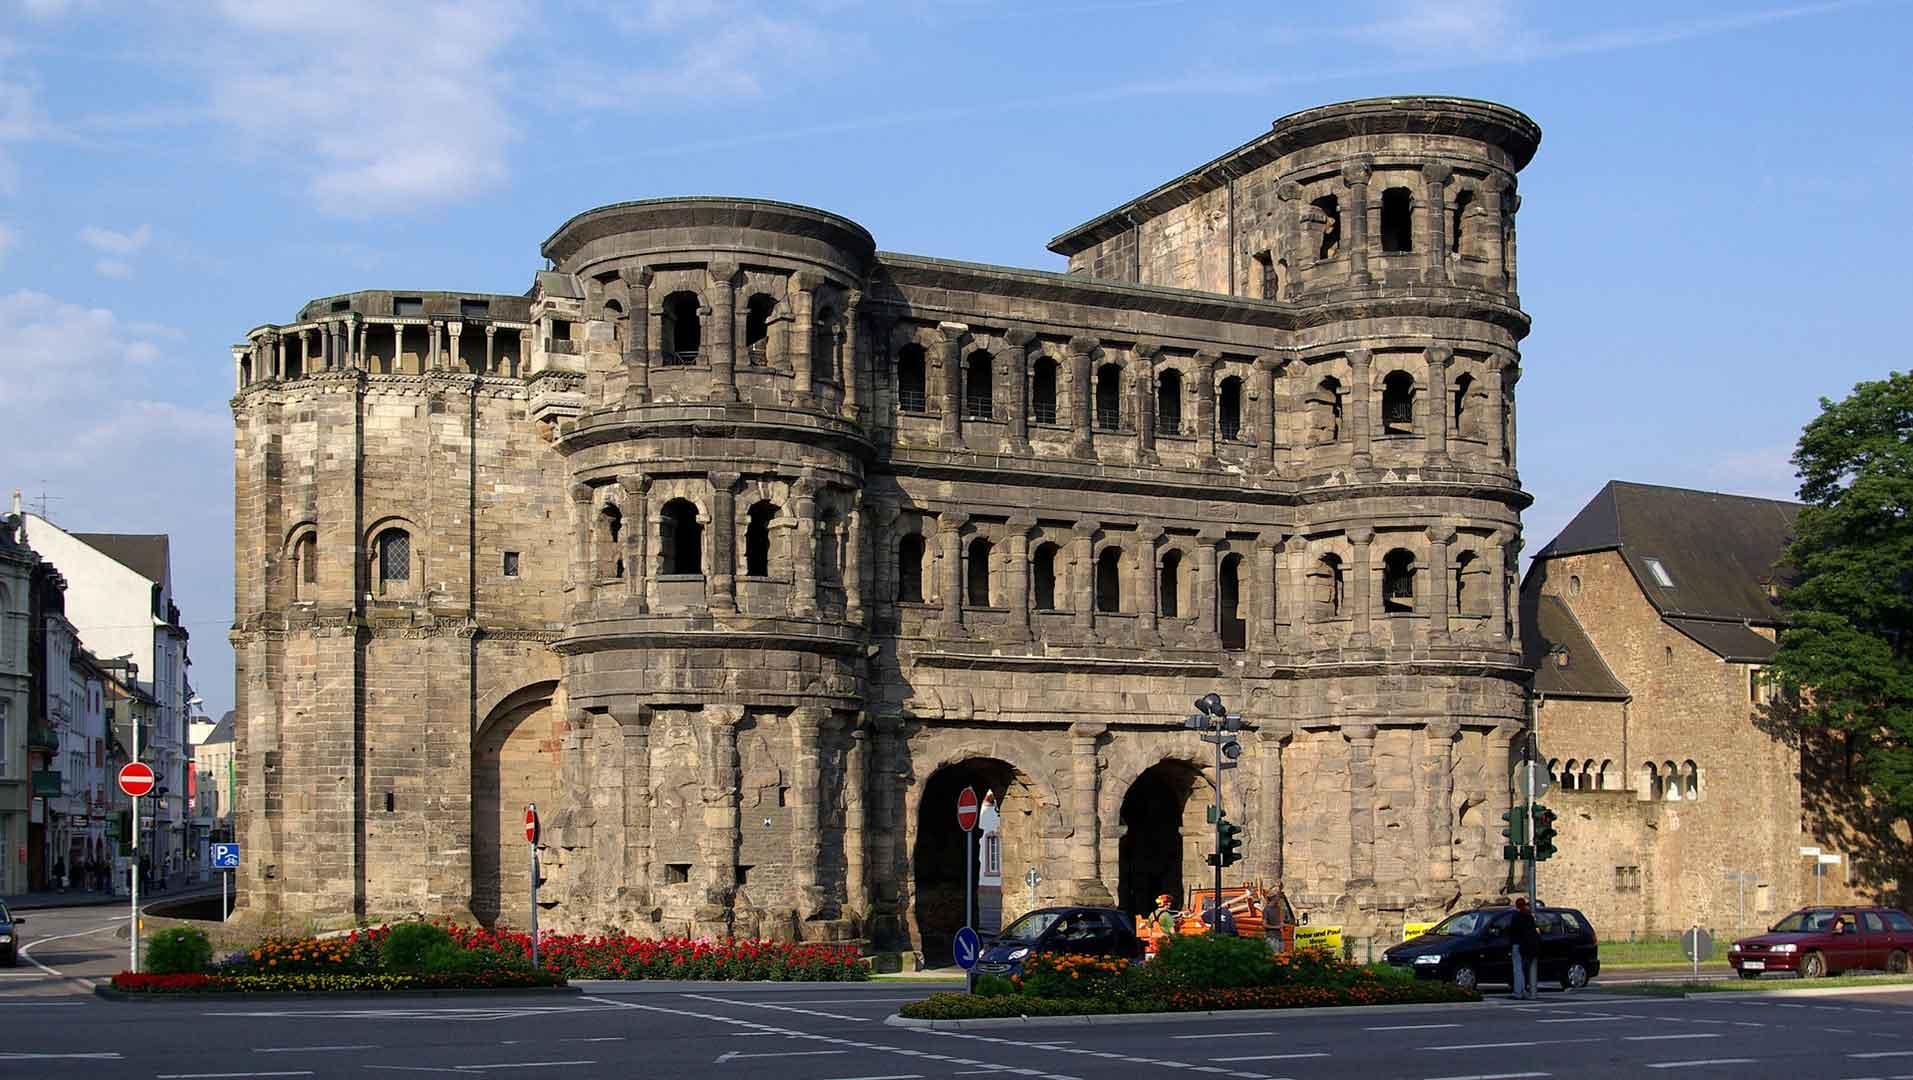 De Romeinse stadspoort Porta Nigra in Trier.